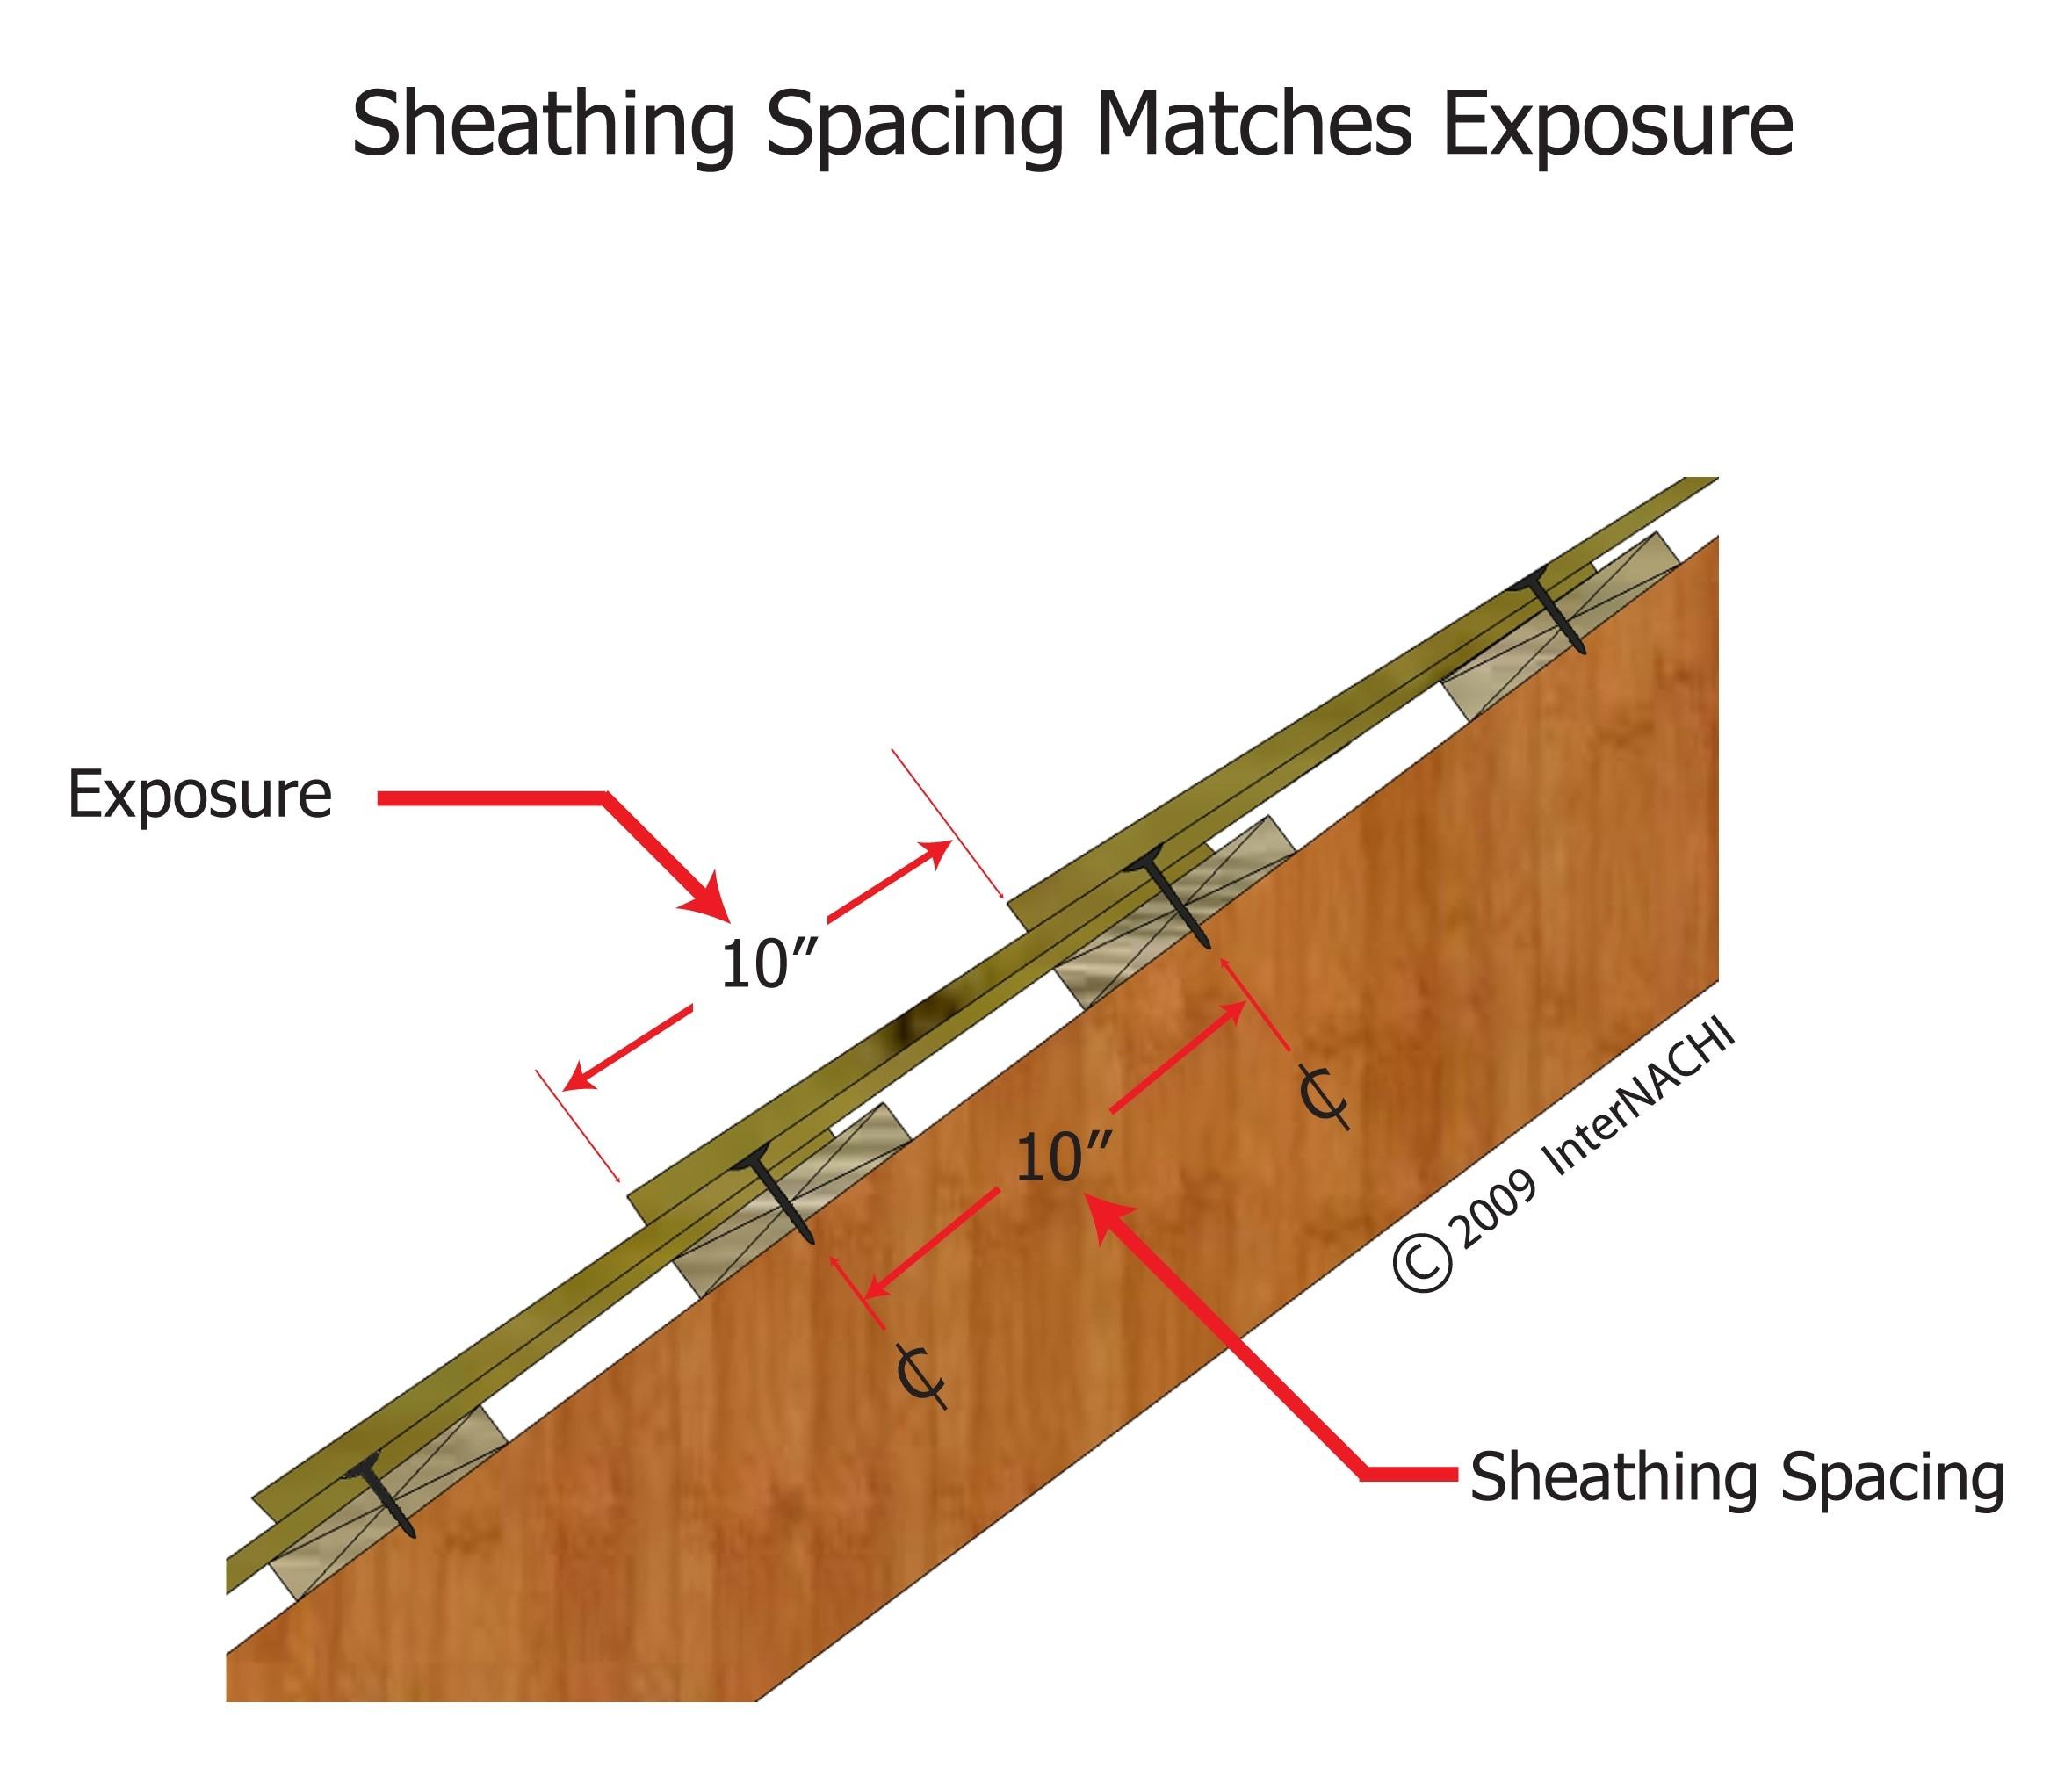 Sheathing spacing matches exposure.